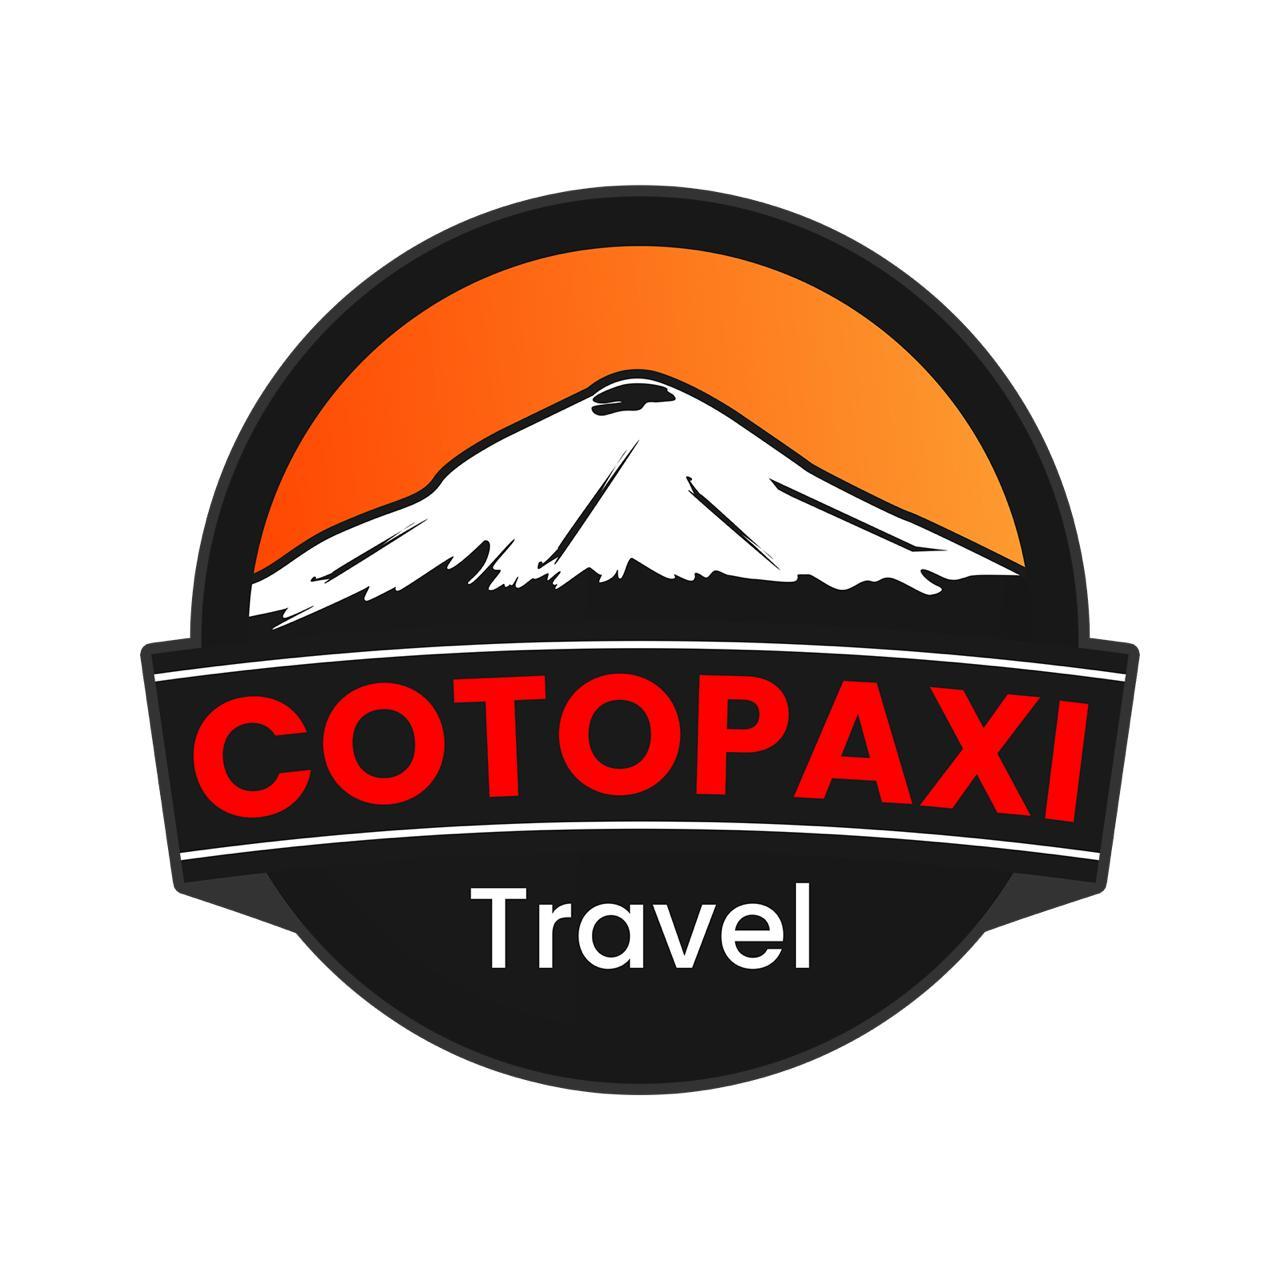 Cotopaxi Travel Blog